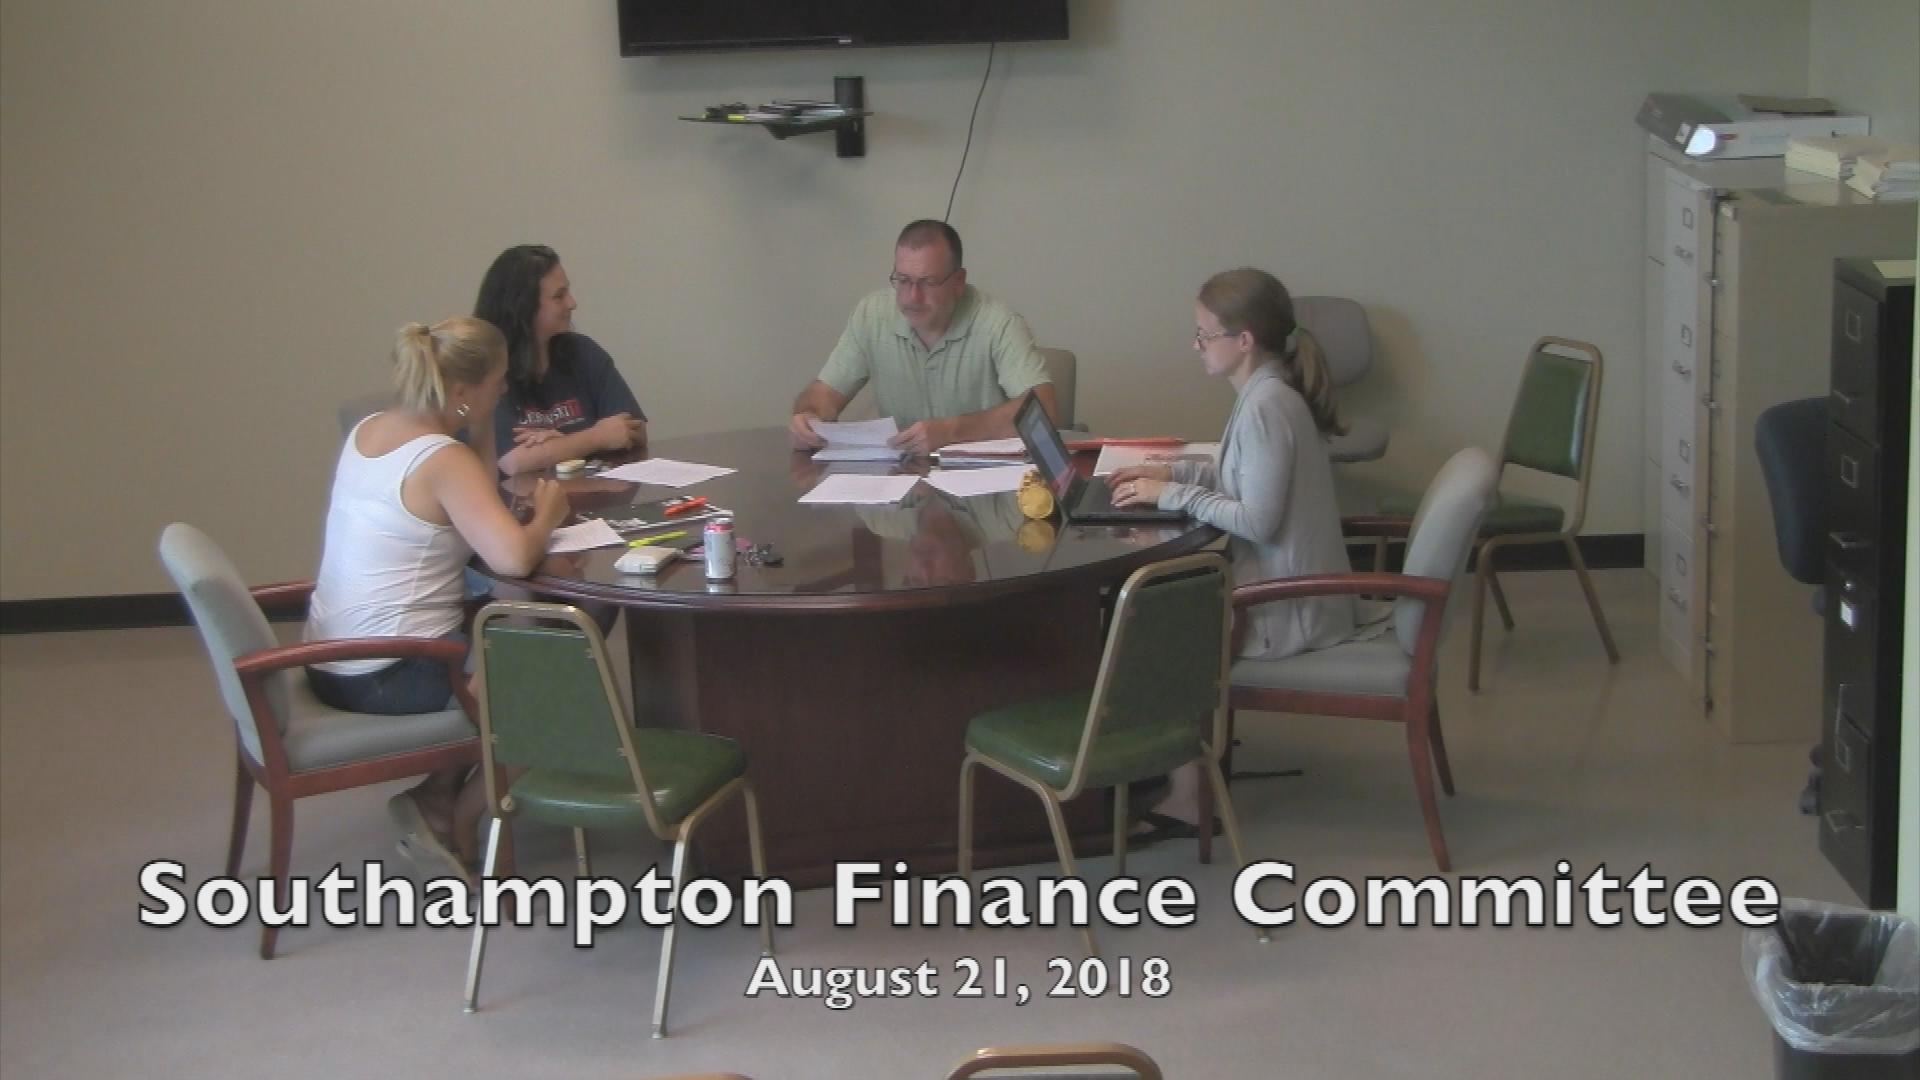 Southampton Finance Committee 8.21.18